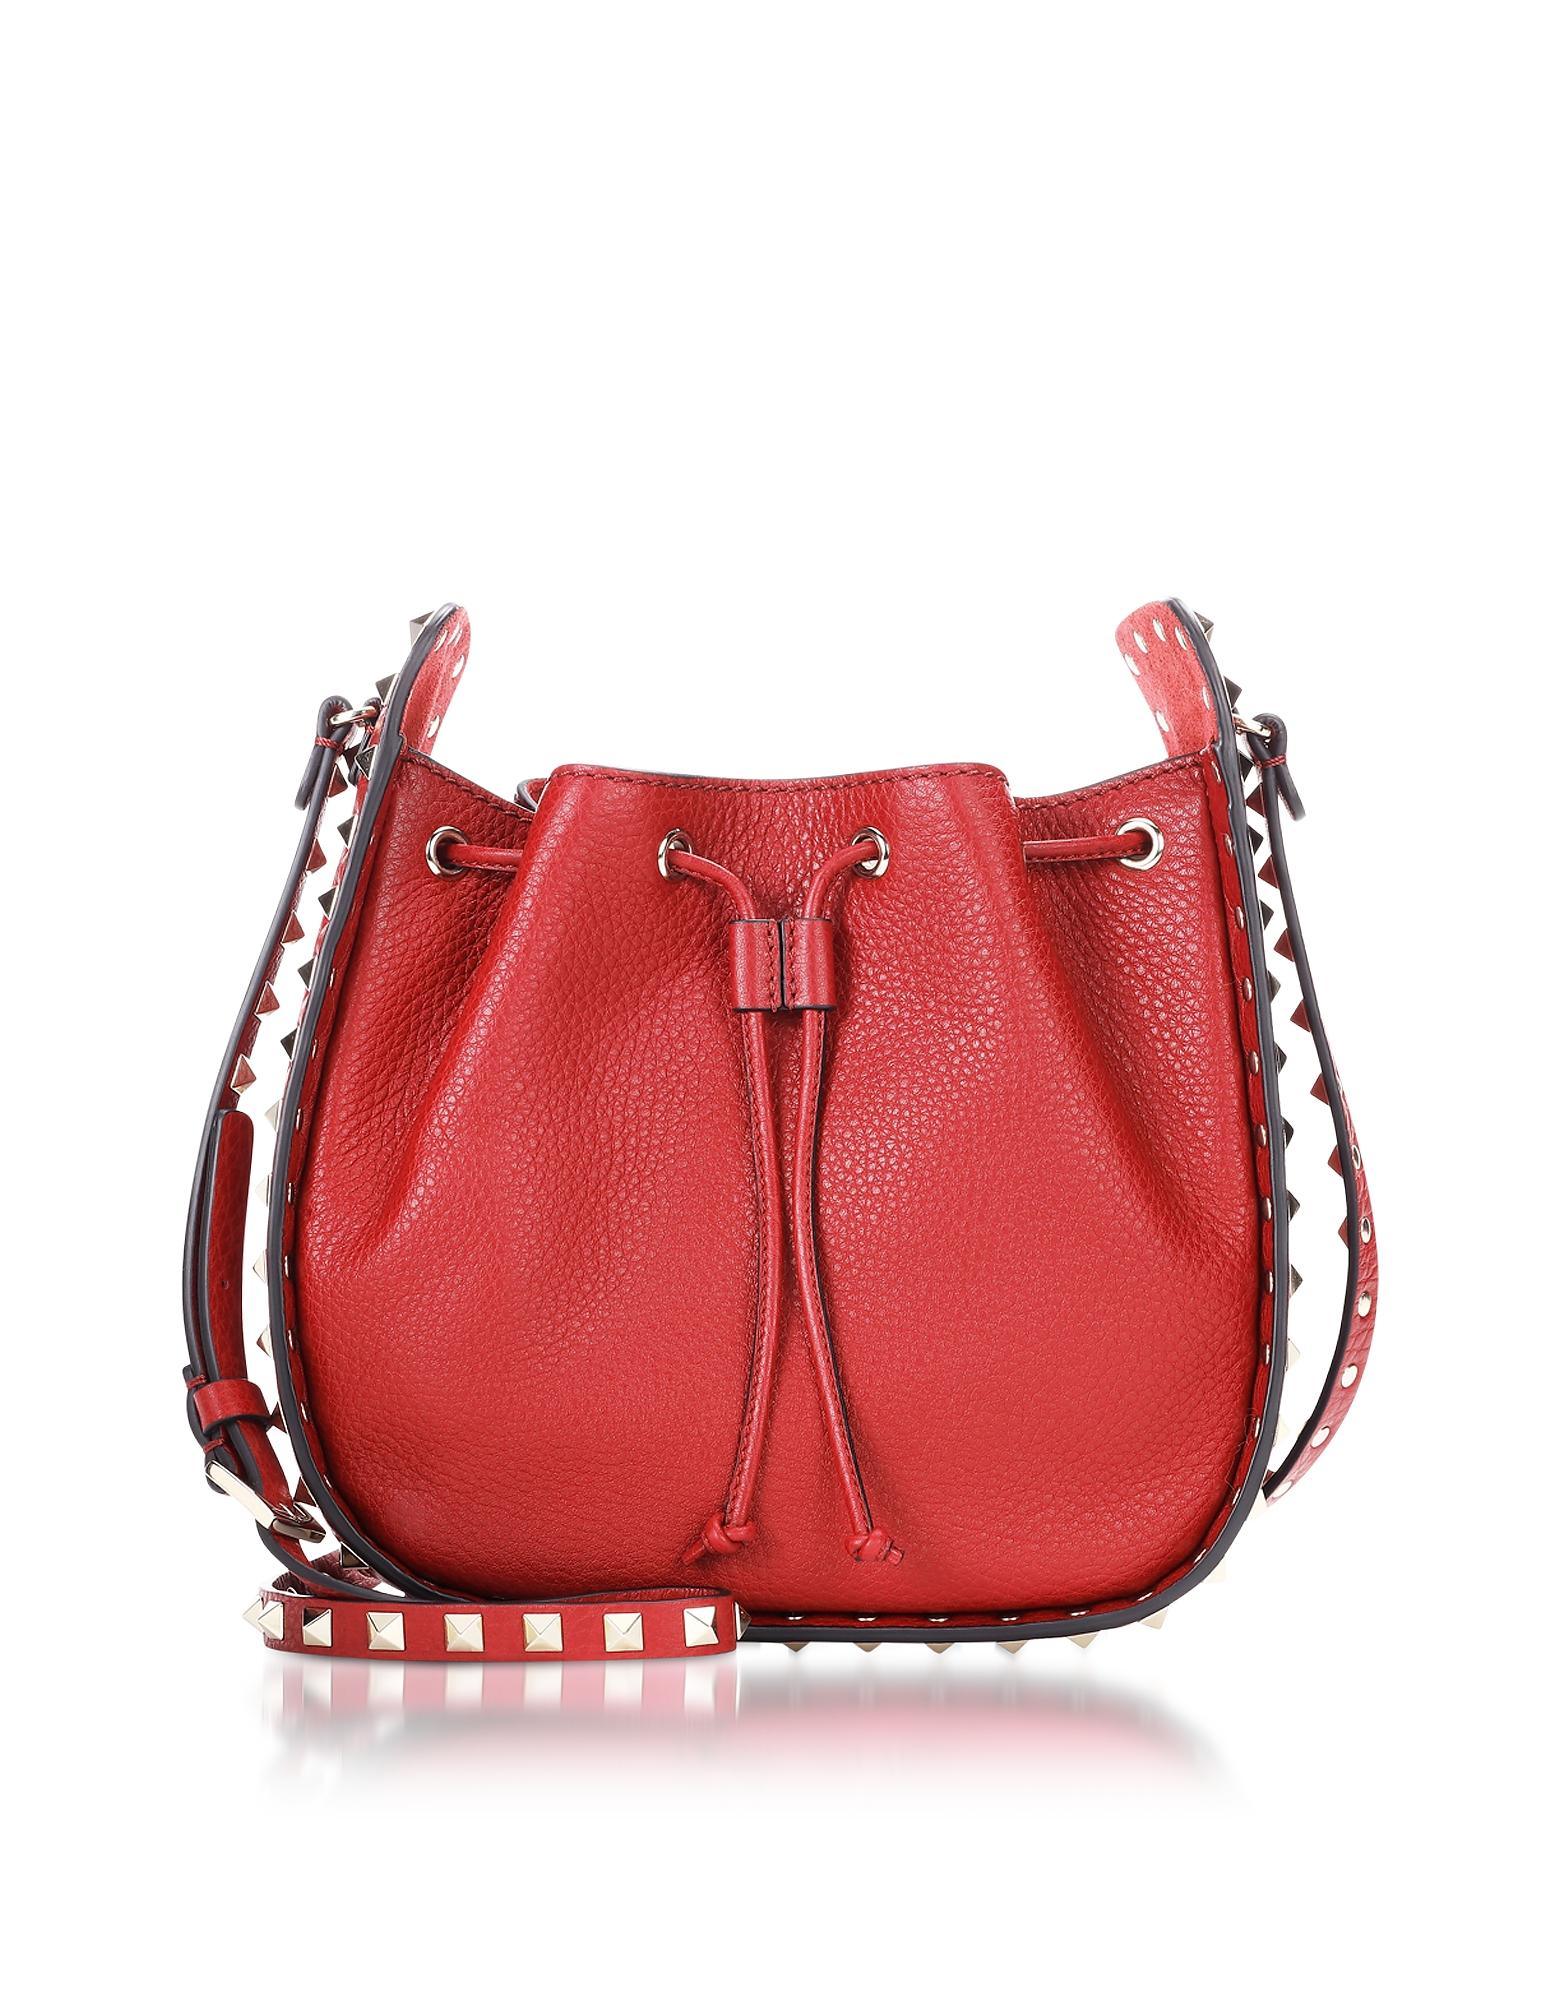 Valentino Handbags, Rubin Leather Rockstud Small Bucket Bag